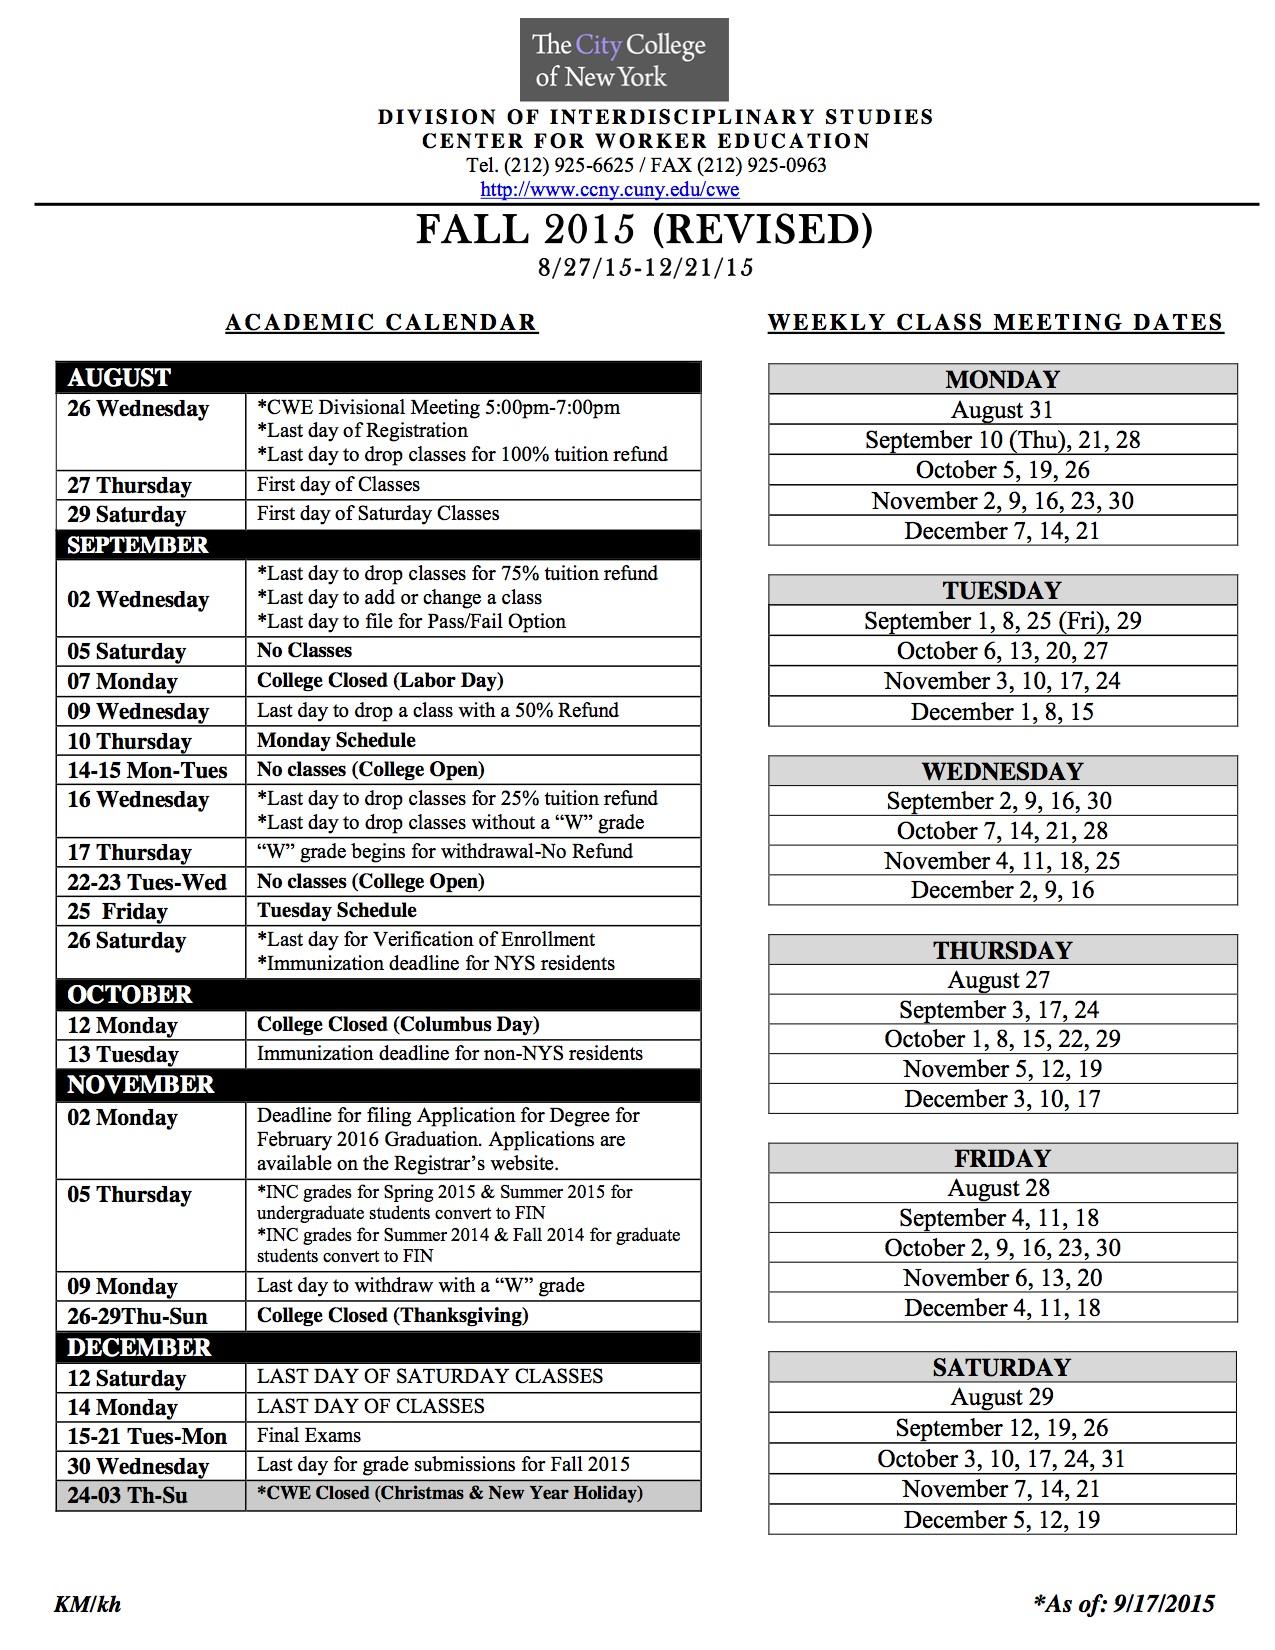 Academic Calendar | The City College Of New York Regarding Queensborough Community College Academic Calendar